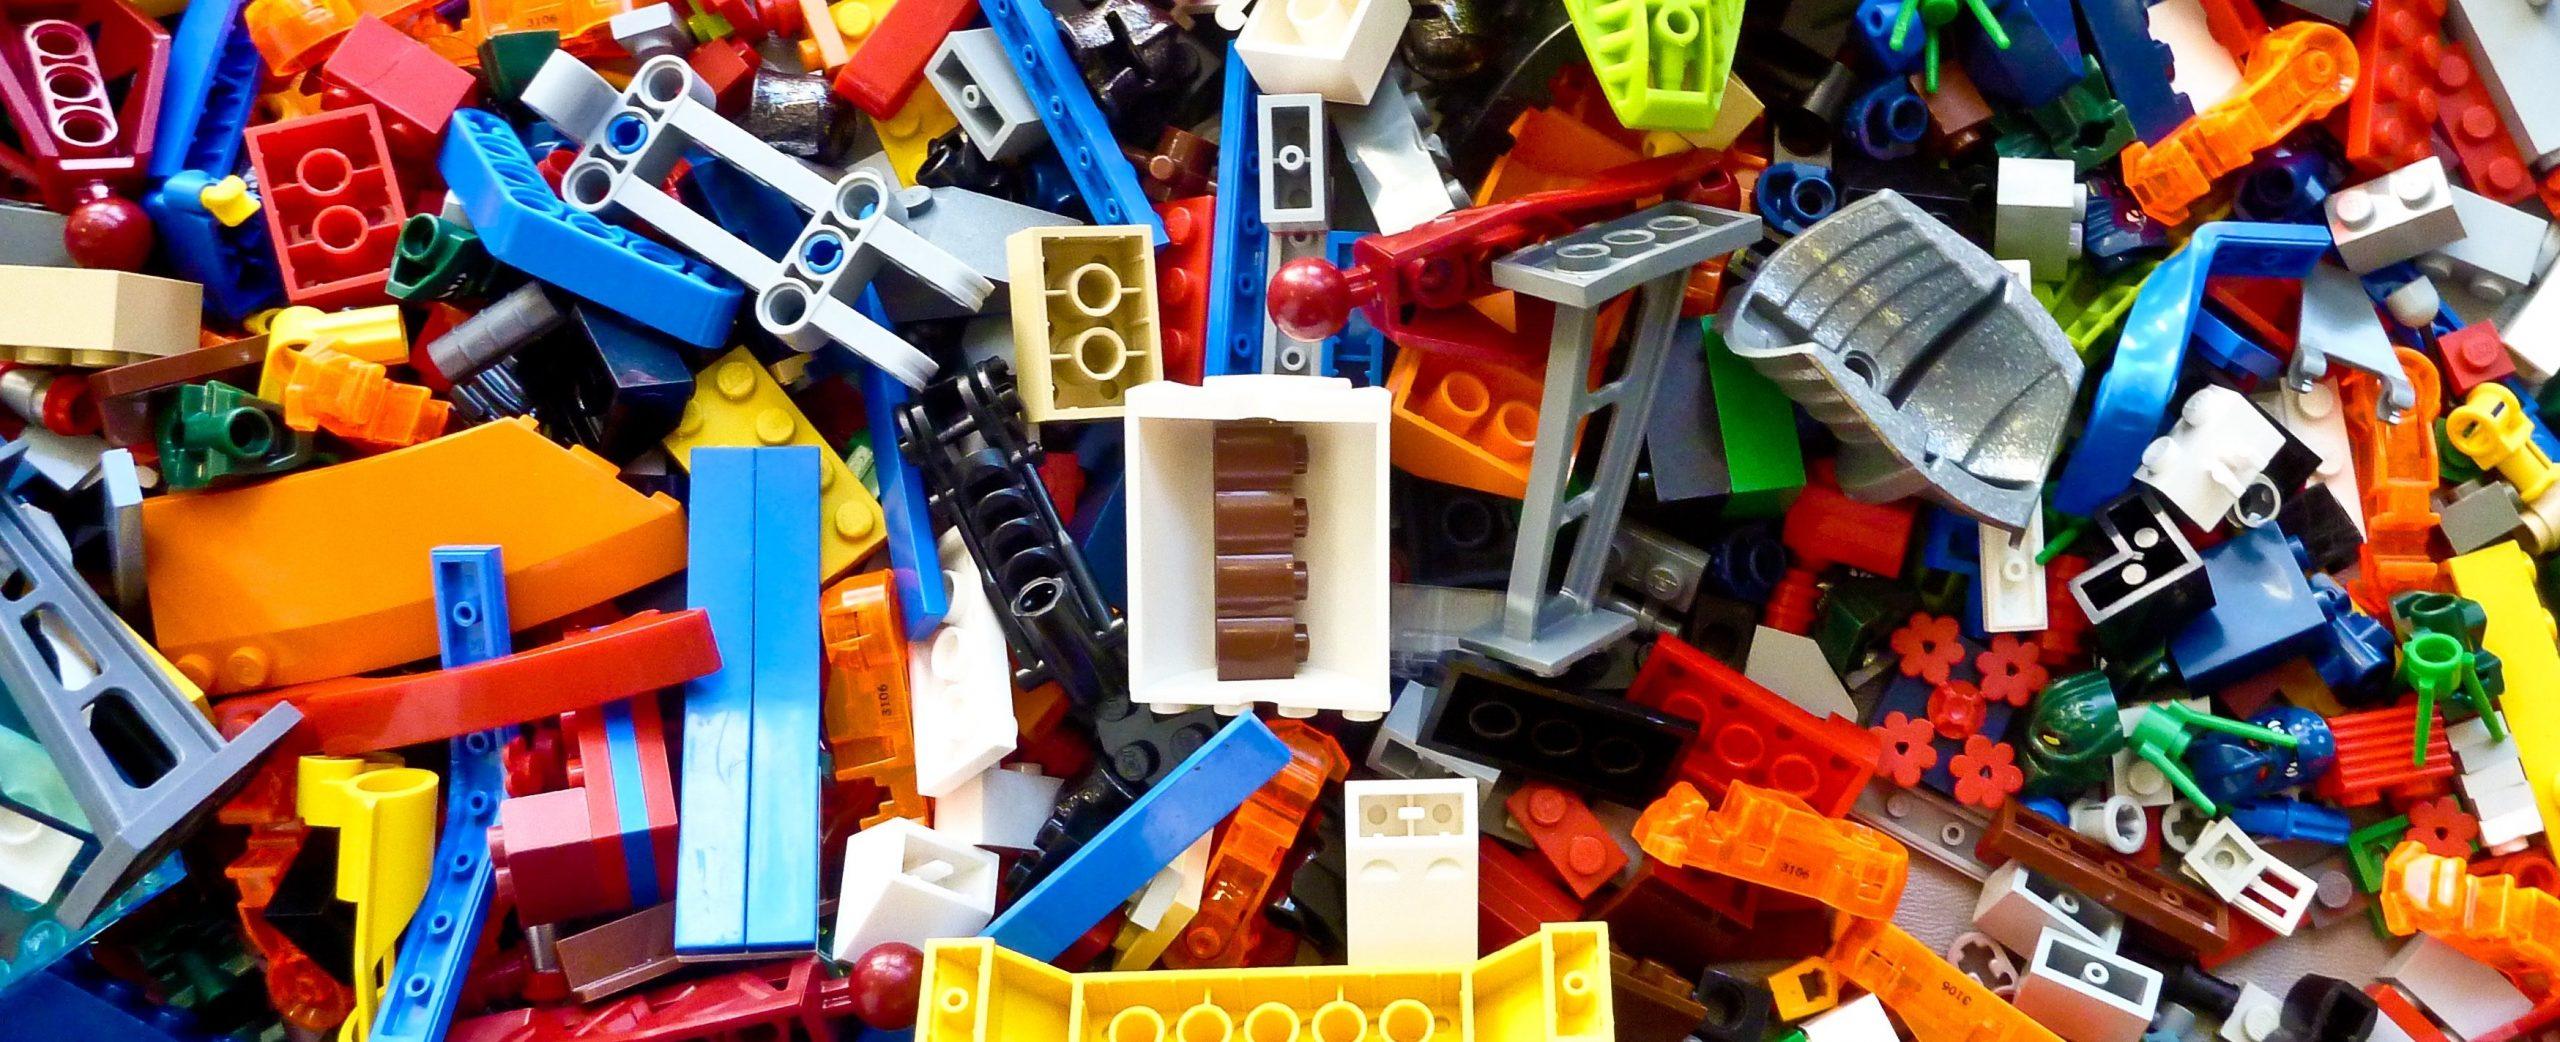 Lego Design Thinking Tools.jpg